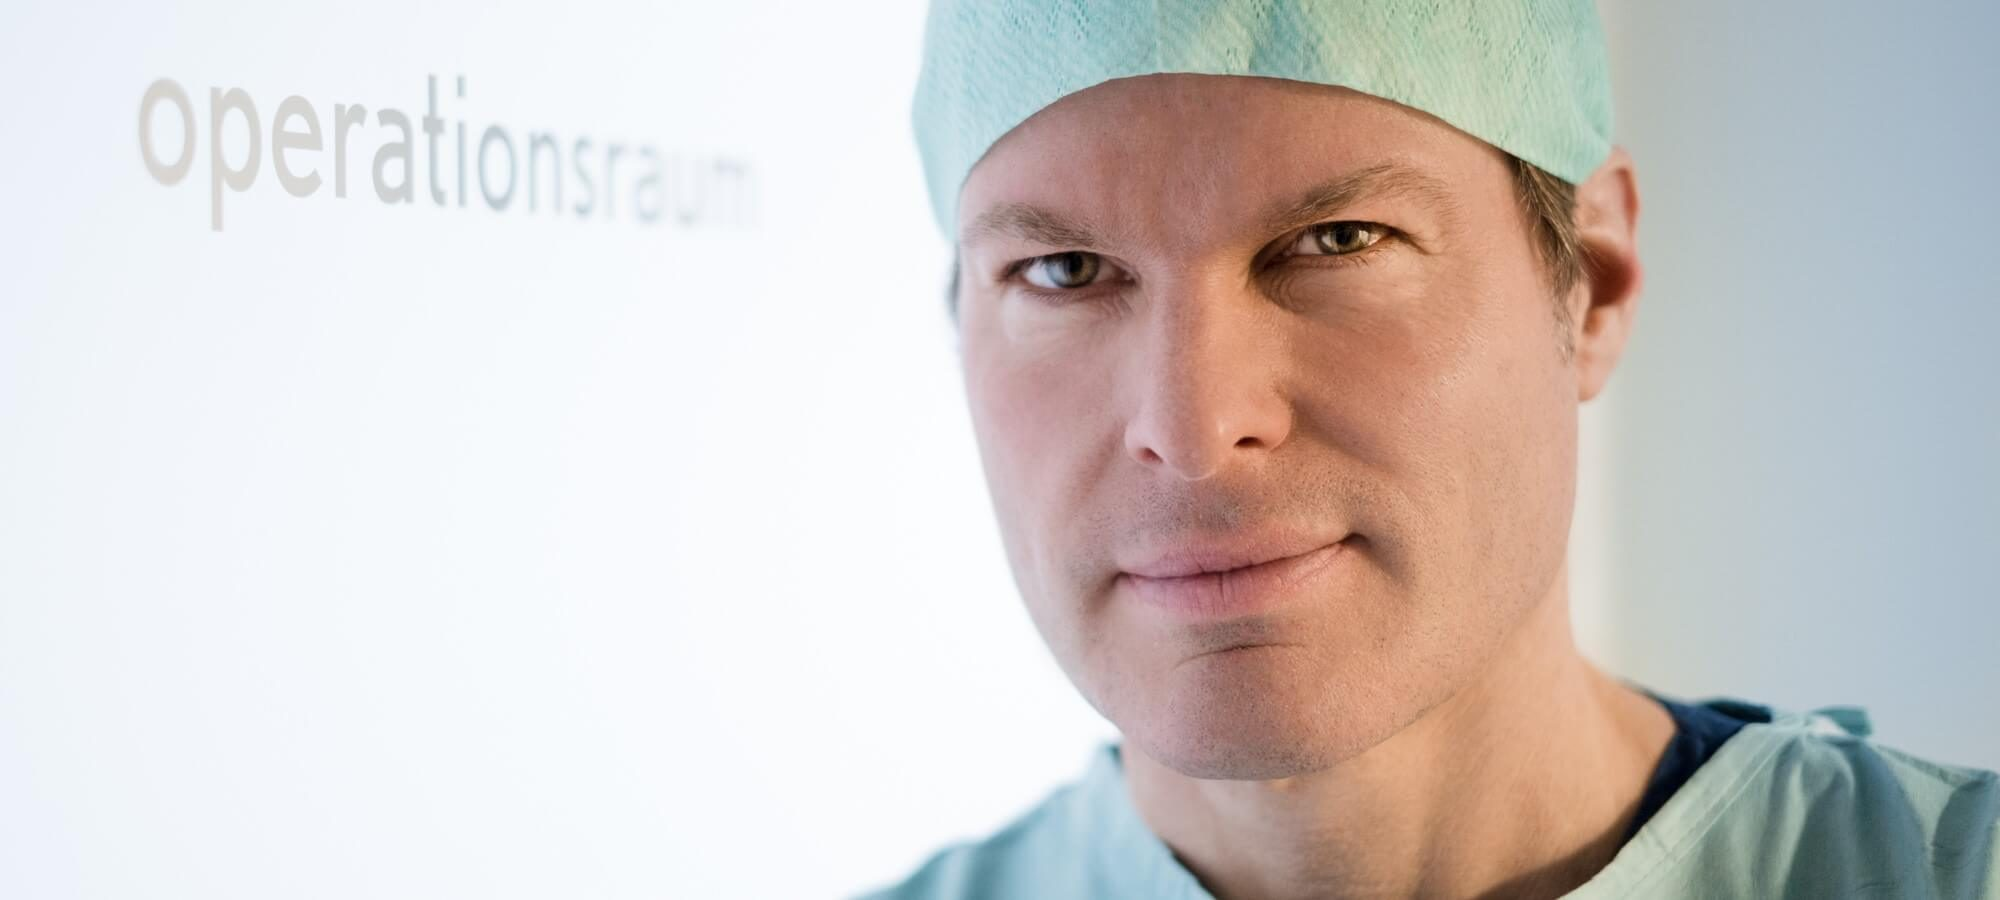 Dr. Dr. Laube Operationsraum | groisman & laube